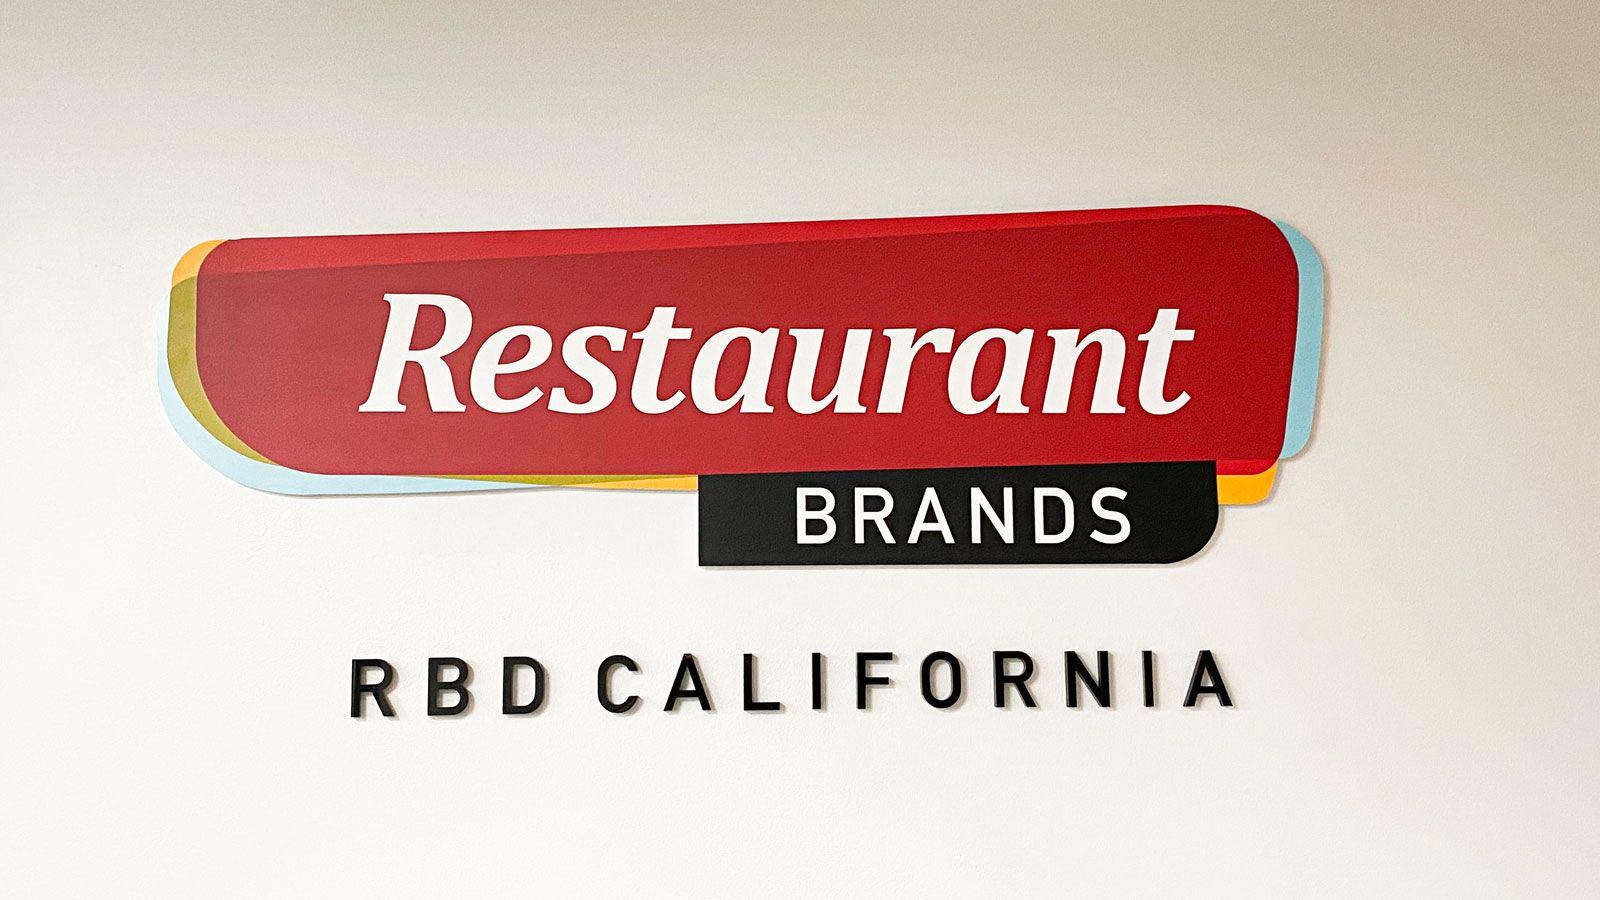 RBD california 3d signs